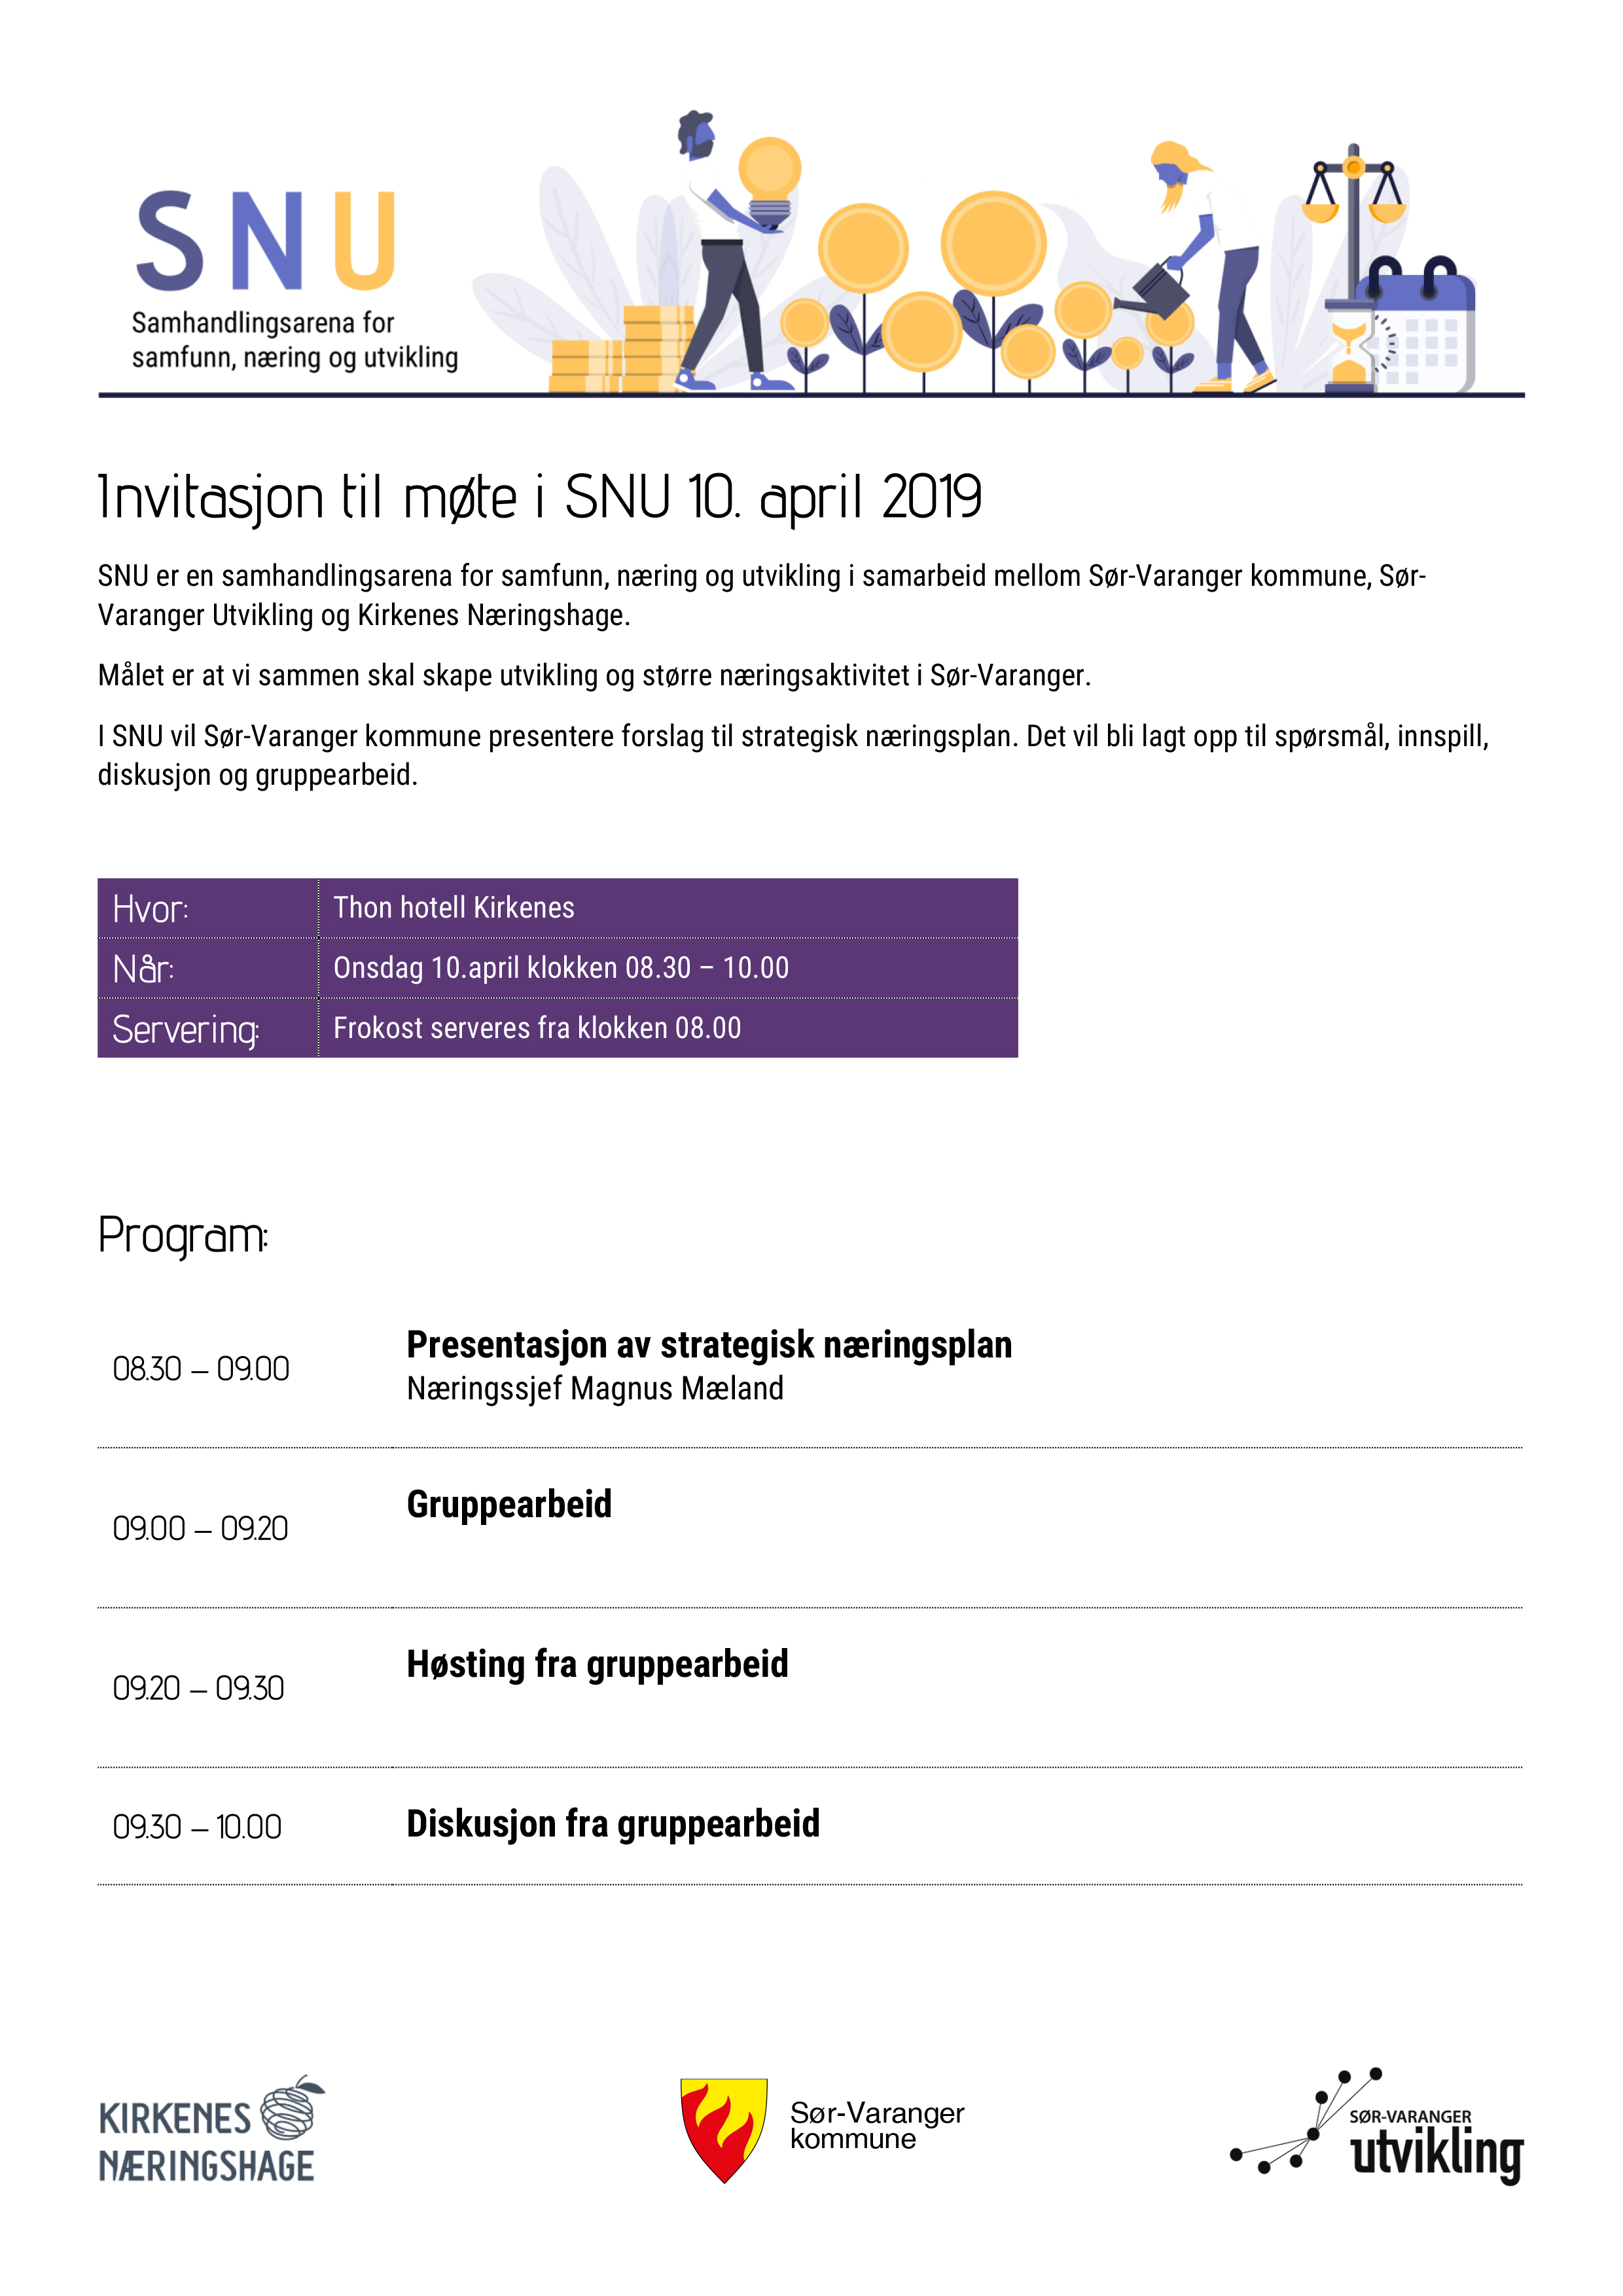 Invitasjon til møte i SNU 10. april 2019